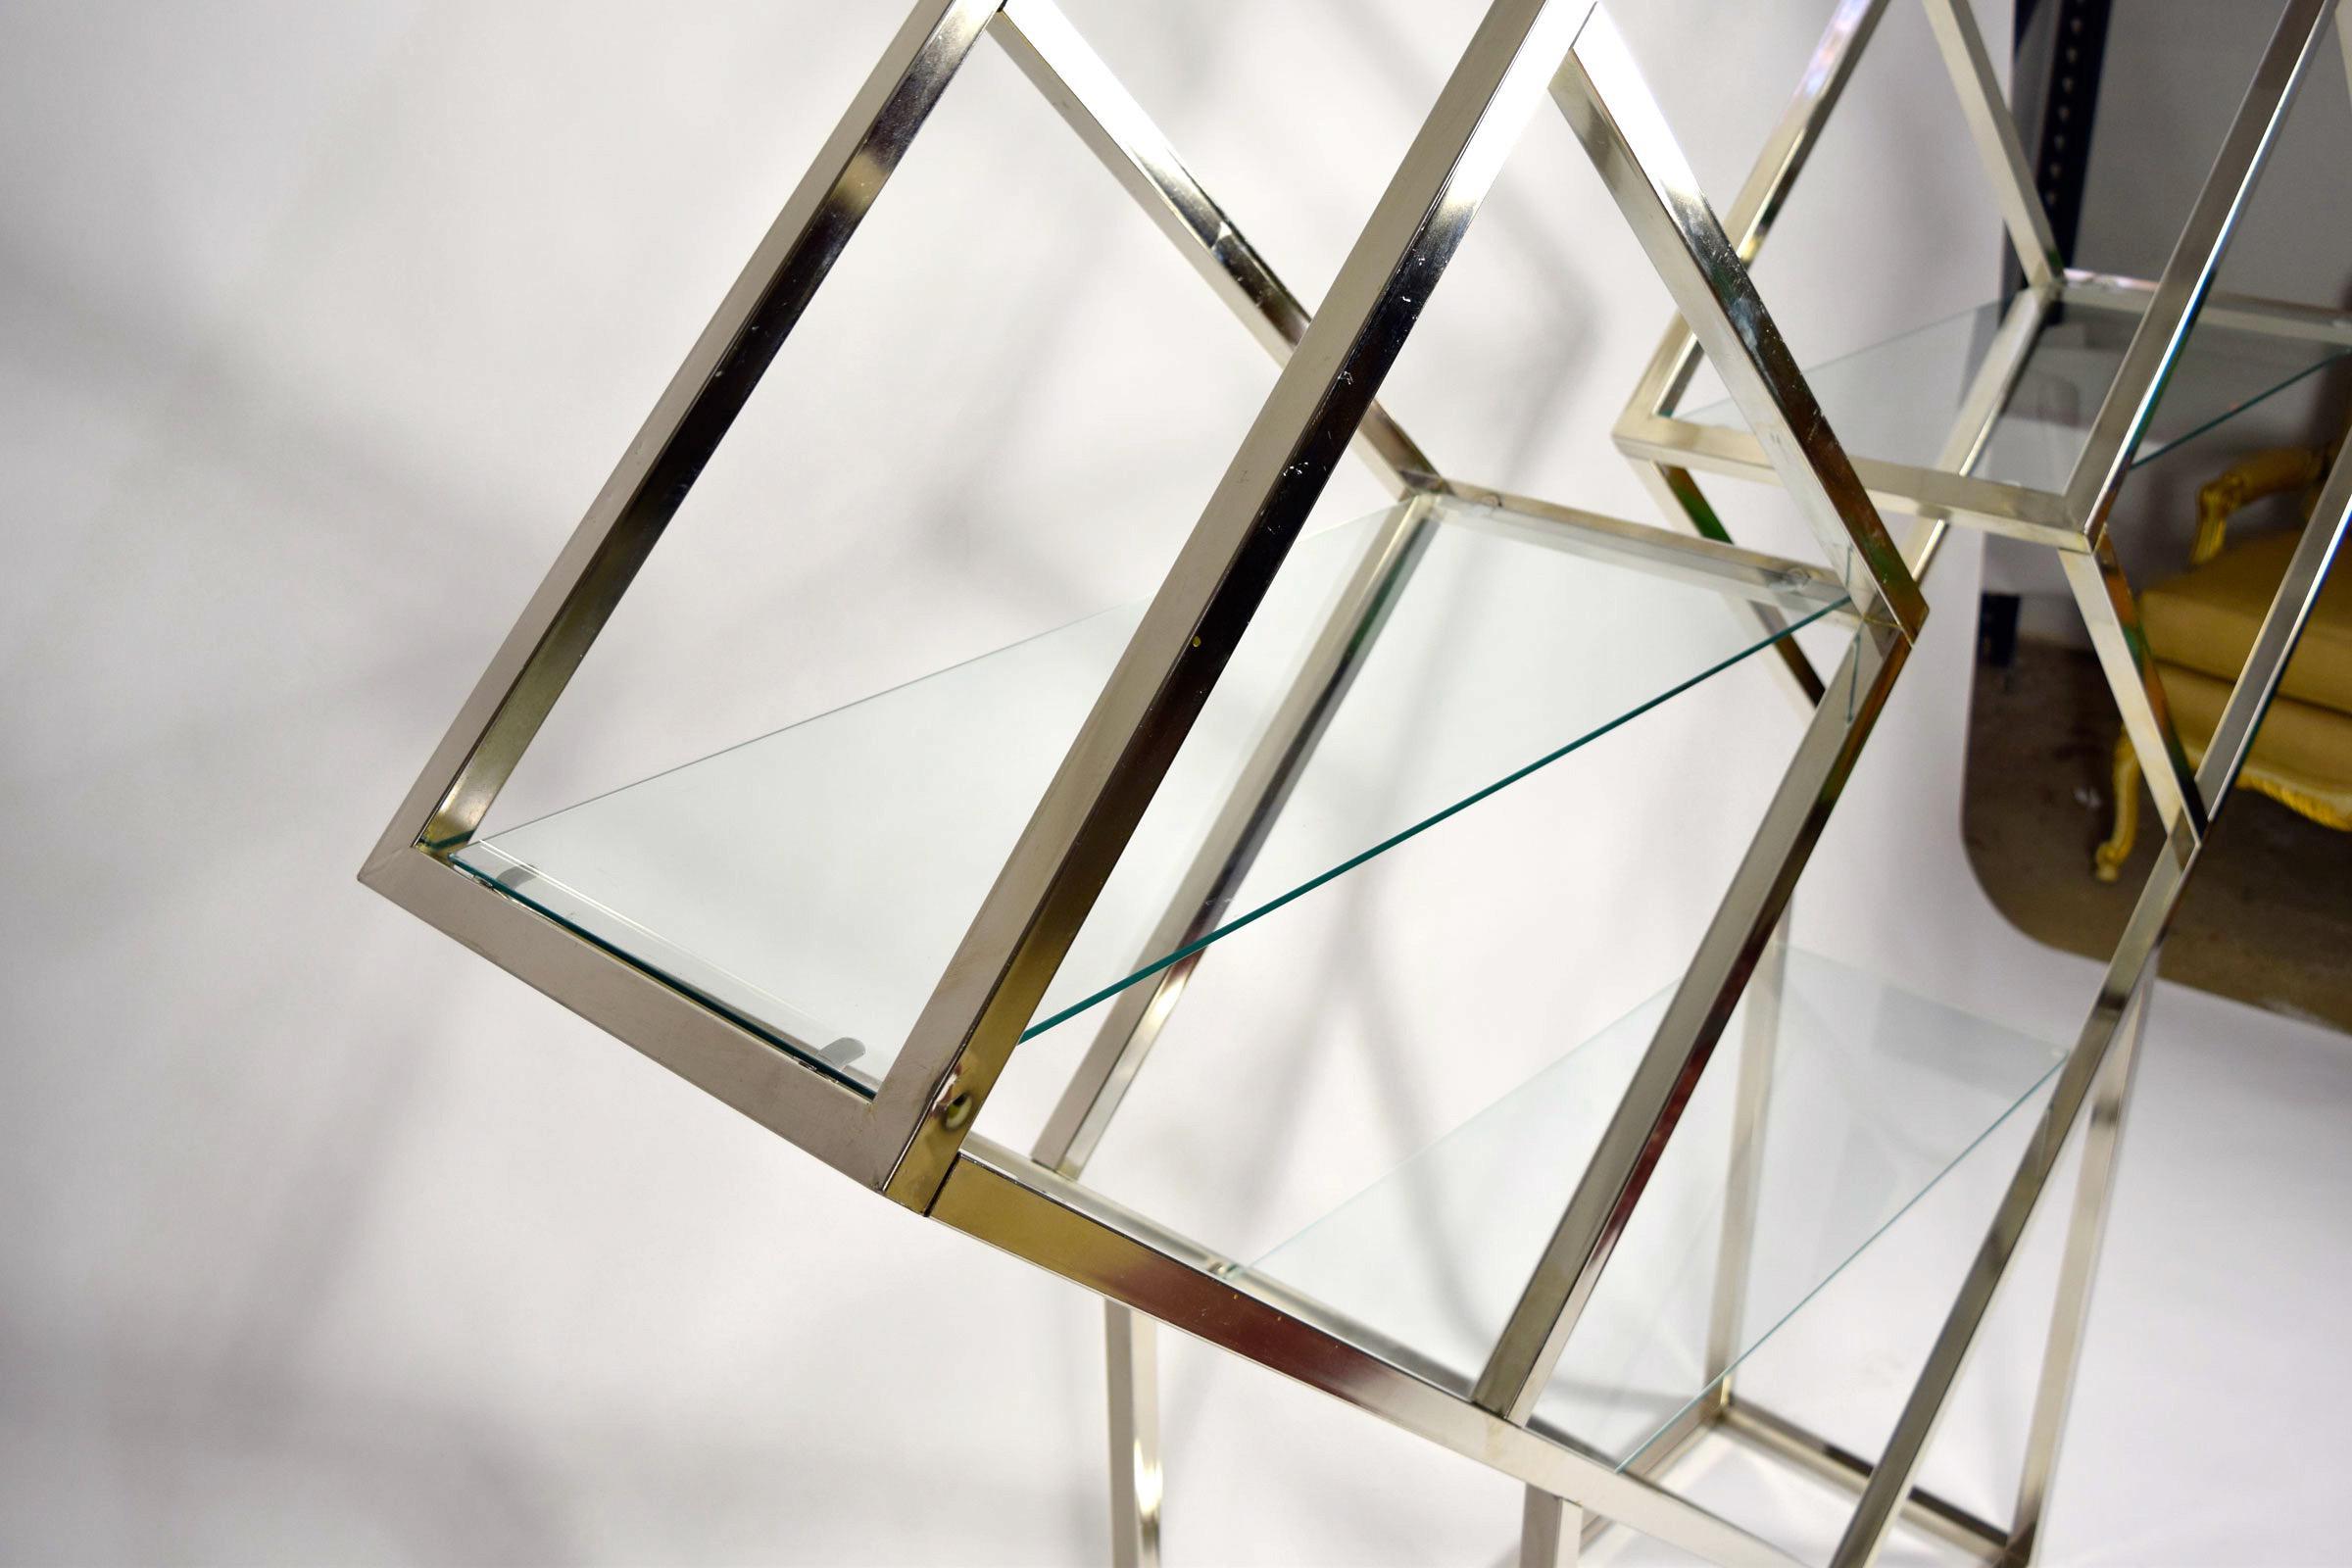 1970u0027s Diamond Shaped Etagere In Silver Finish   Image 7 ...